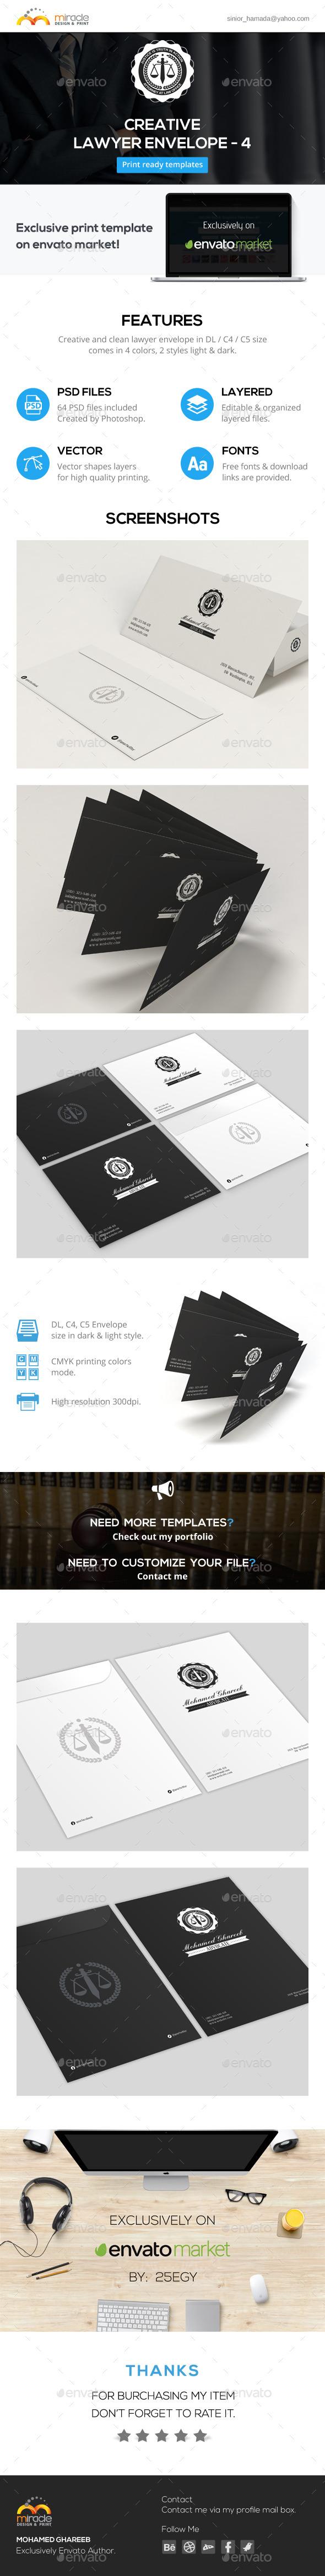 Creative Lawyer Envelope #4 - Stationery Print Templates